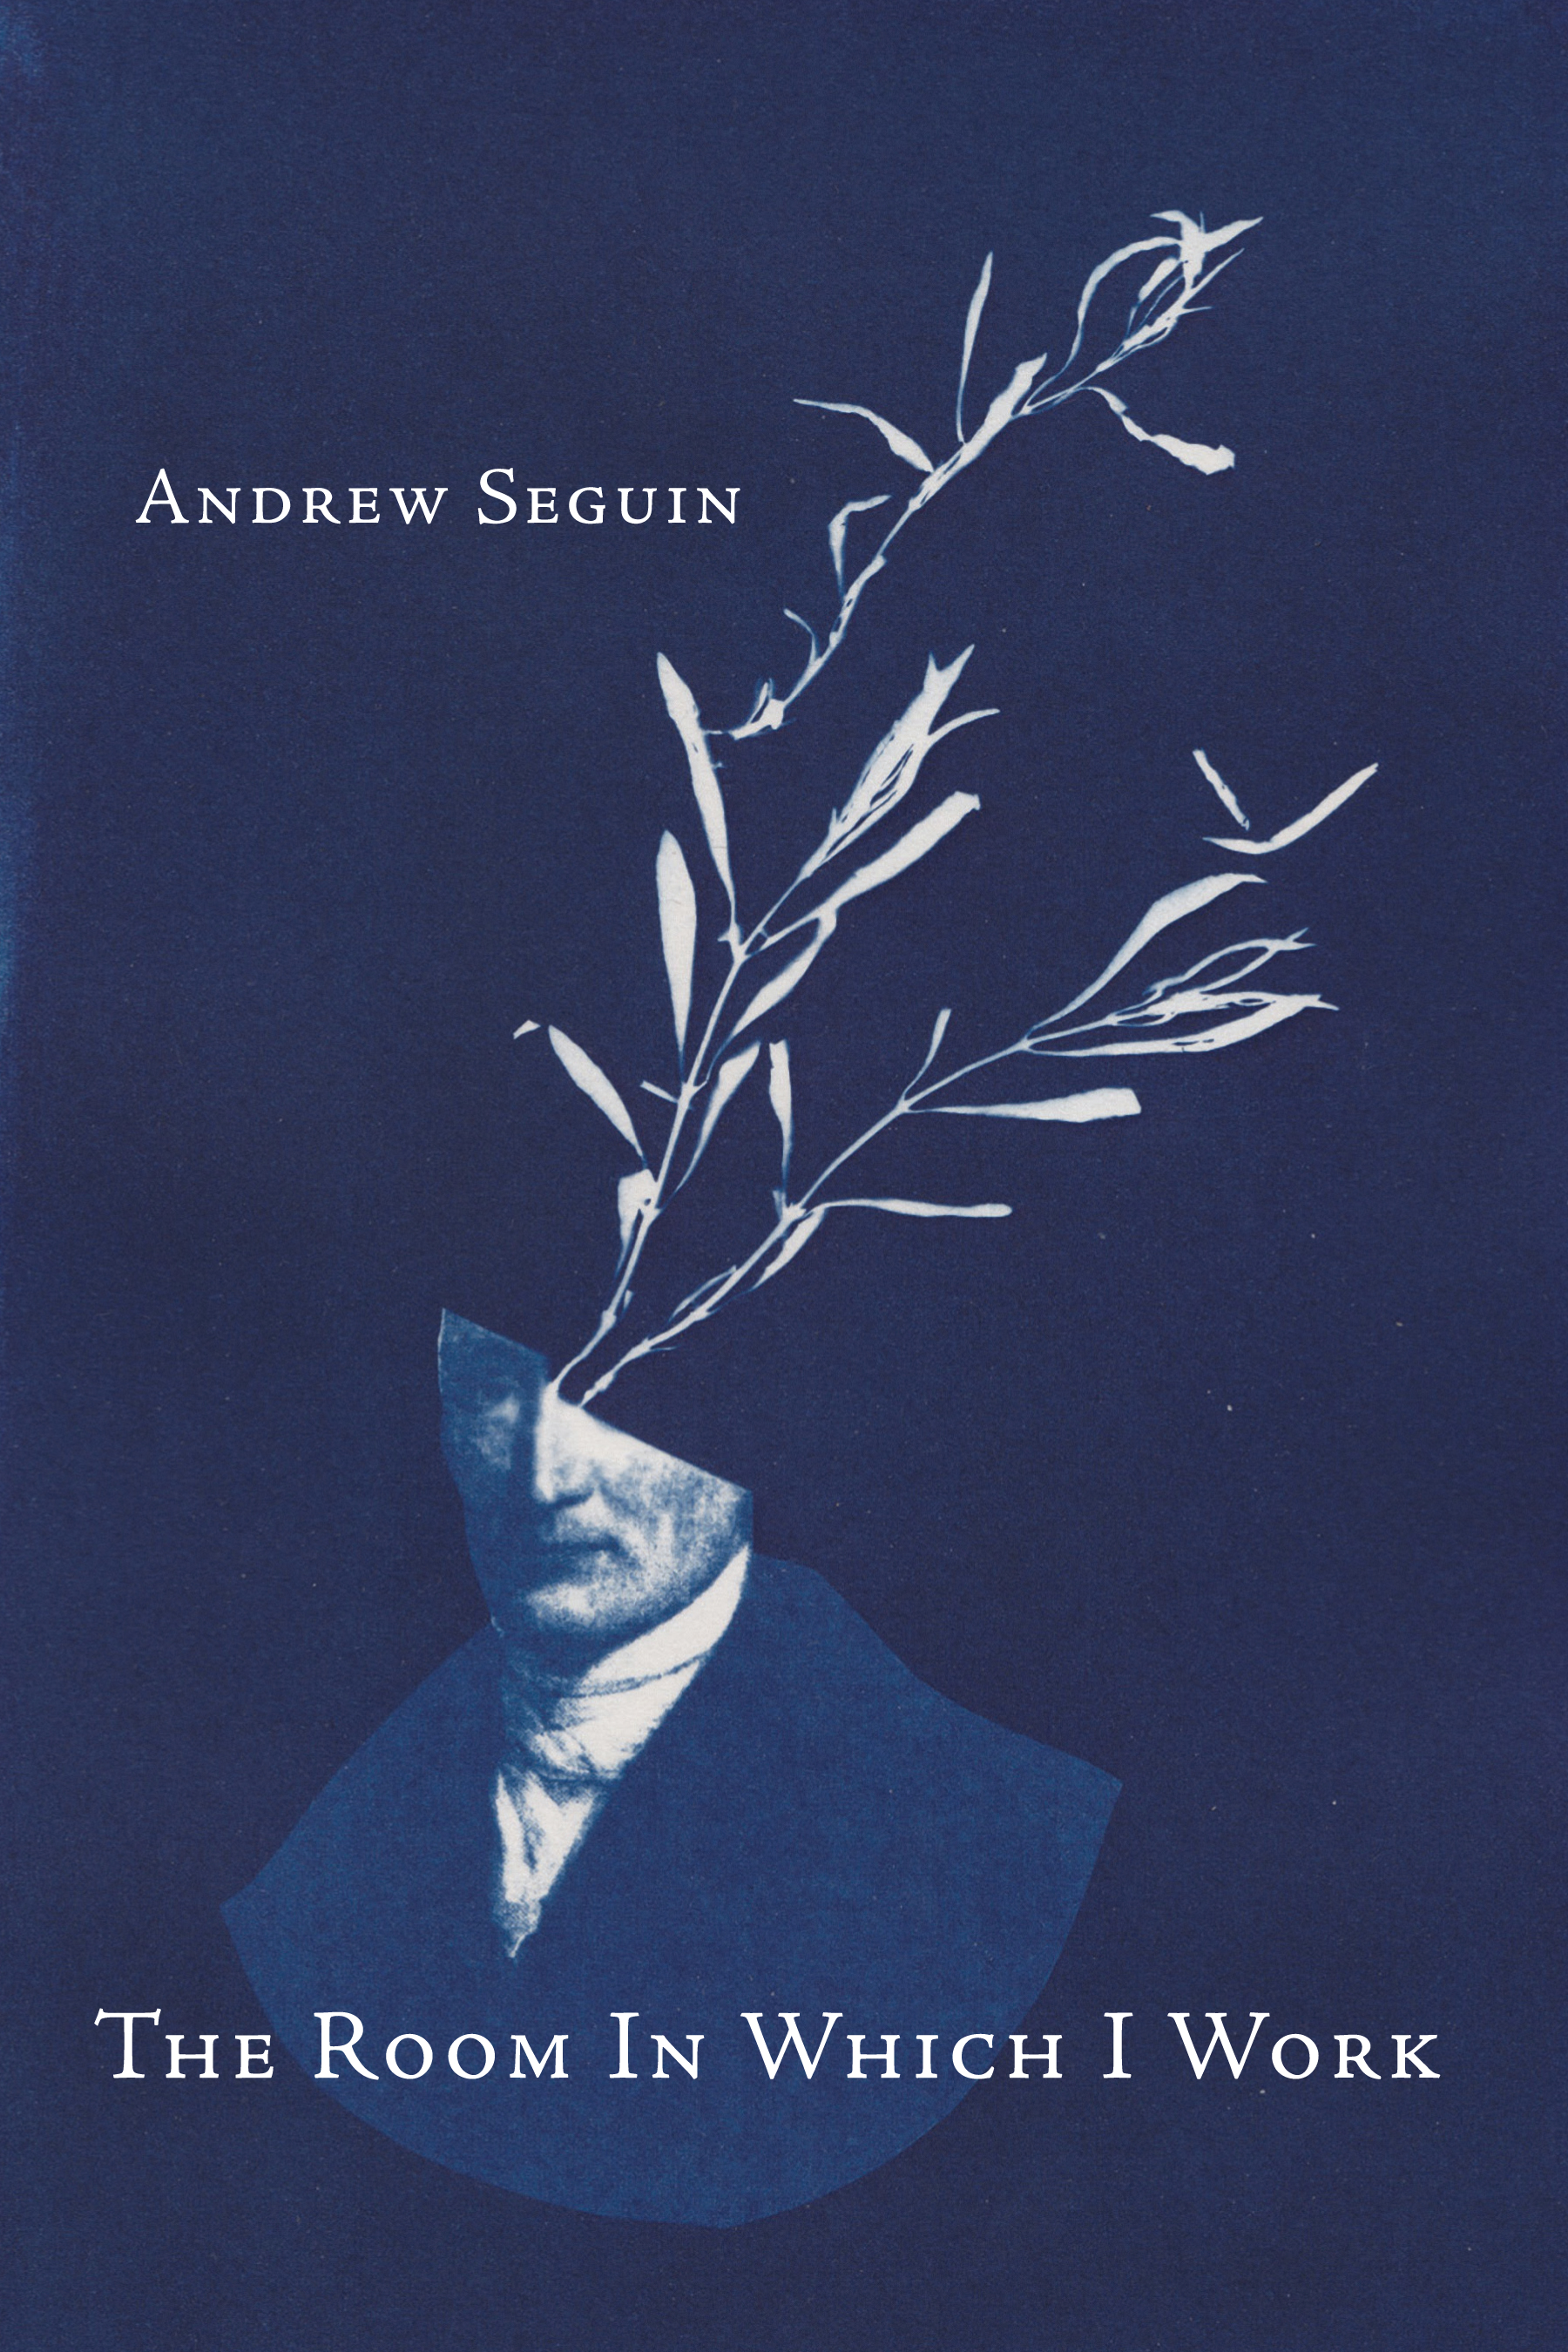 Seguin-front-cover-300dpi-RGB.jpg